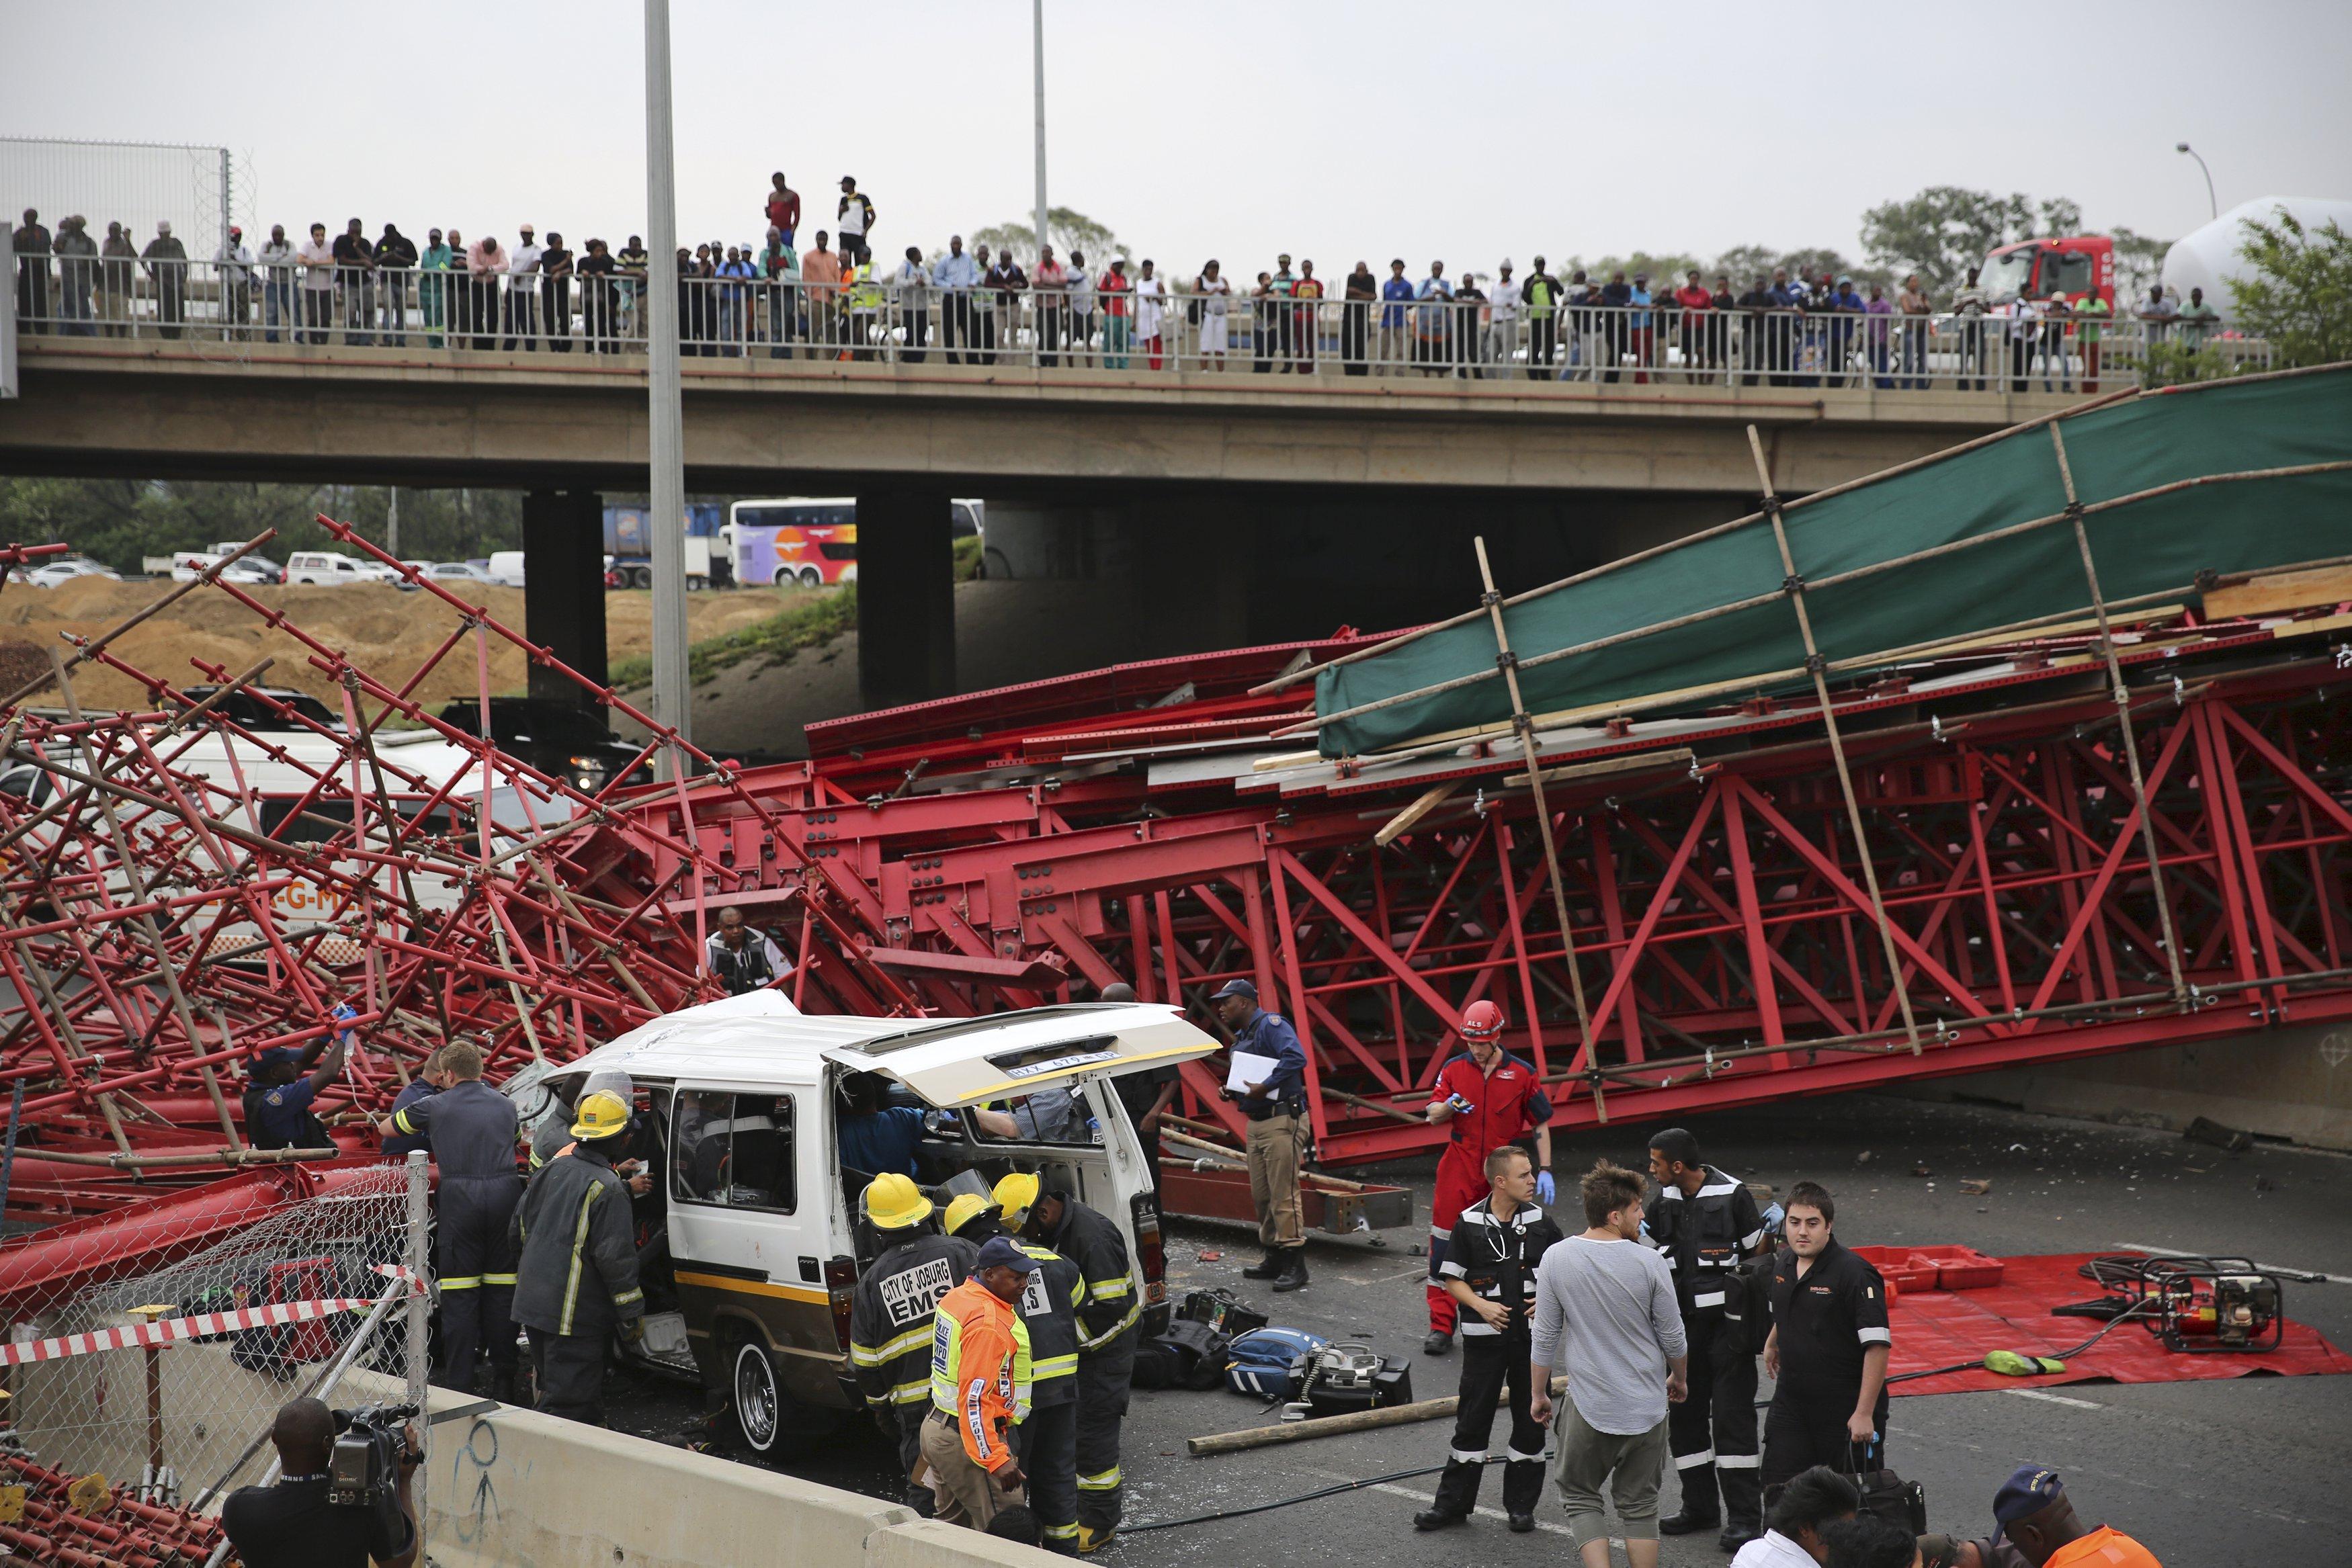 Pejalan kaki melihat paramedis berusaha mengeluarkan penumpang dari sebuah taksi ketika jembatan di jalan layang M1 roboh dekat jalan keluar menuju Sandton, Afrika Selatan, Rabu (14/10). Satu orang tewas dan 17 lainnya mengalami cedera ketika sebuah jembatan roboh di atas jalan utama Johannesburg kemarin, menurut petugas gawat darurat setempat. Reruntuhan jembatan baja kusut berwarna merah melintang di tengah jalan layang M1 Johannesburg, dekat jalan keluar menuju Sandton, lokasi gedung bursa saham, menambah kekacauan lalu lintas jam-sibuk. ANTARA FOTO/REUTERS/Siphiwe Sibeko.